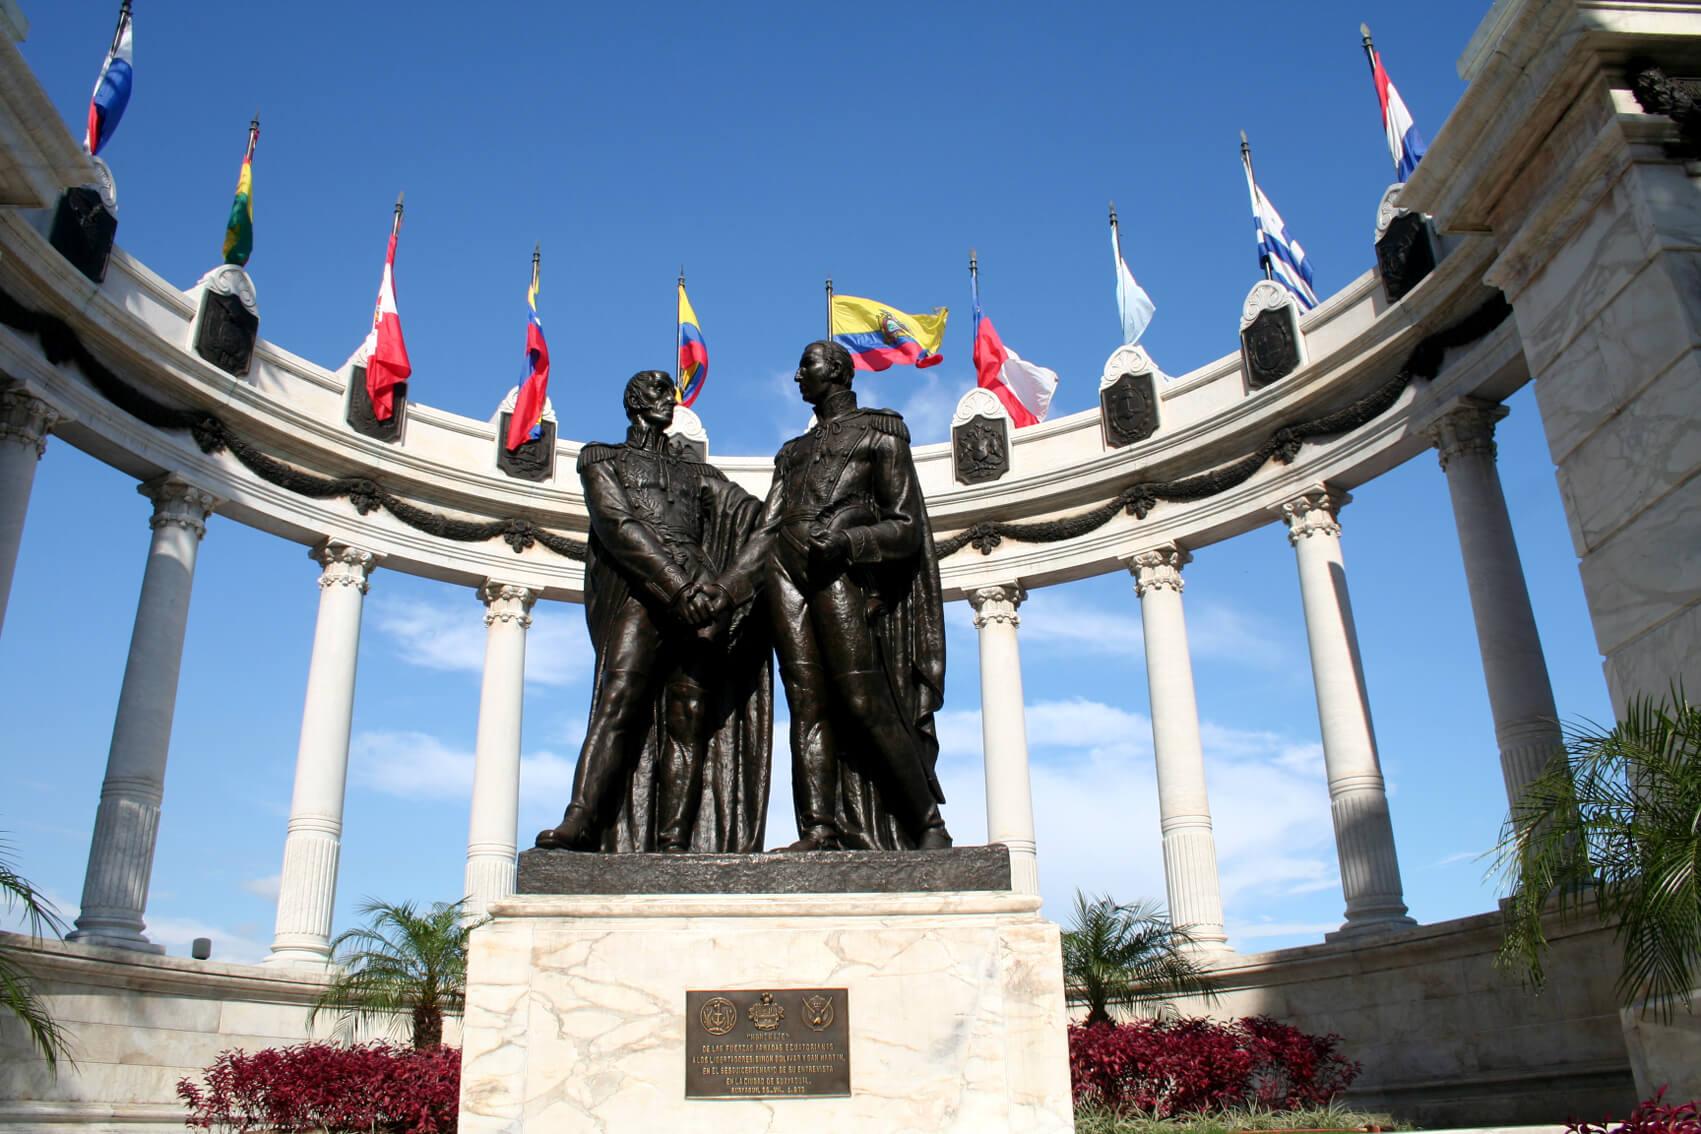 Monumentos-de-Argentina-16